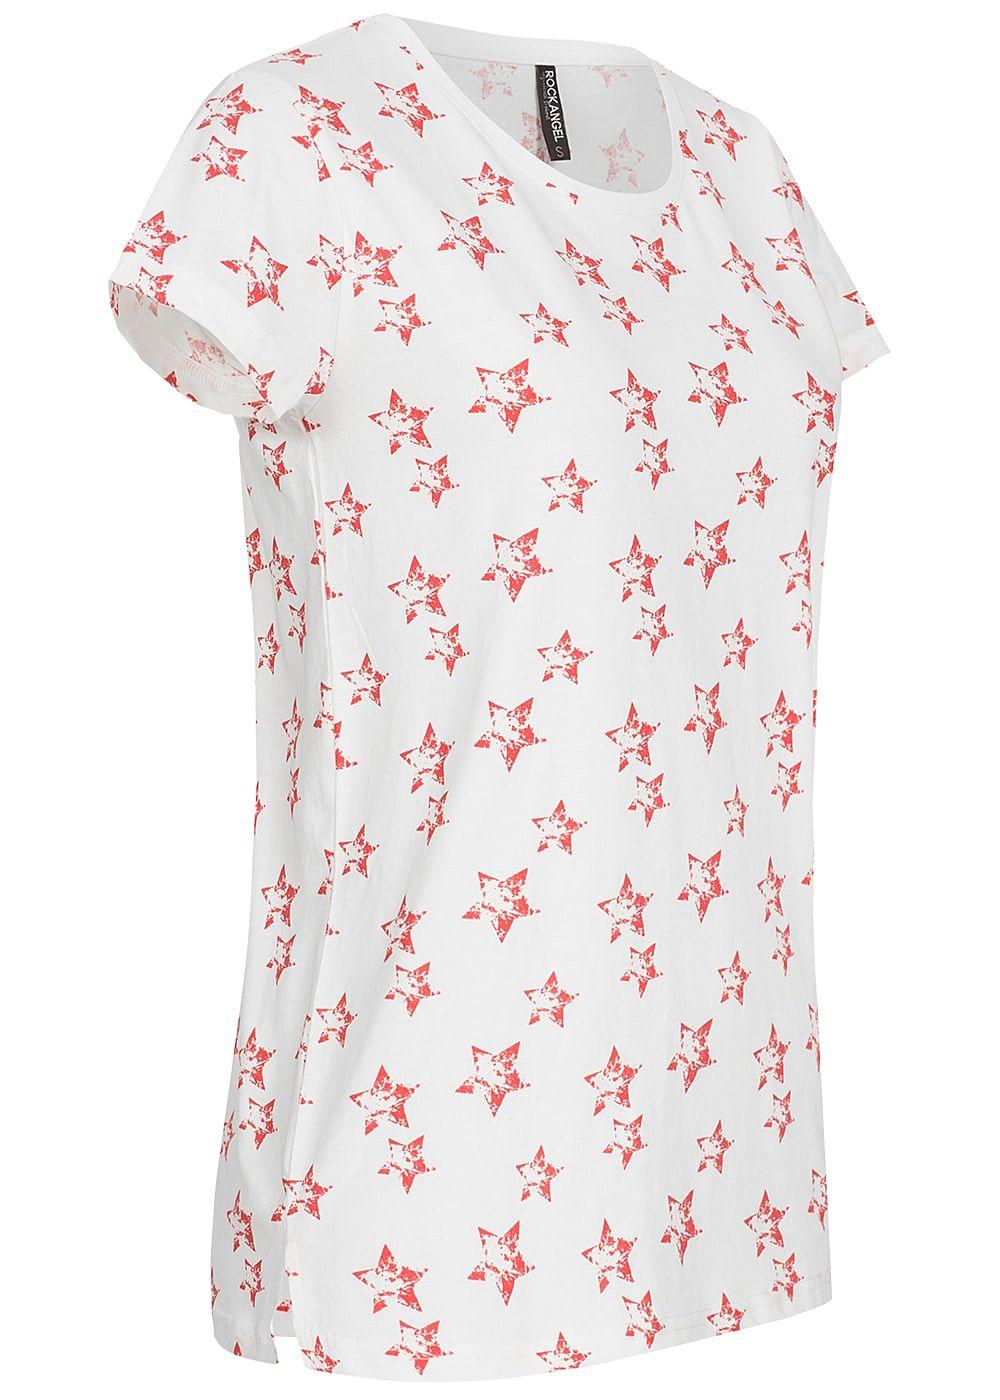 3639d2b9445b1b Eight2Nine Damen T-Shirt Stern Muster by Rock Angel off weiss rot ...